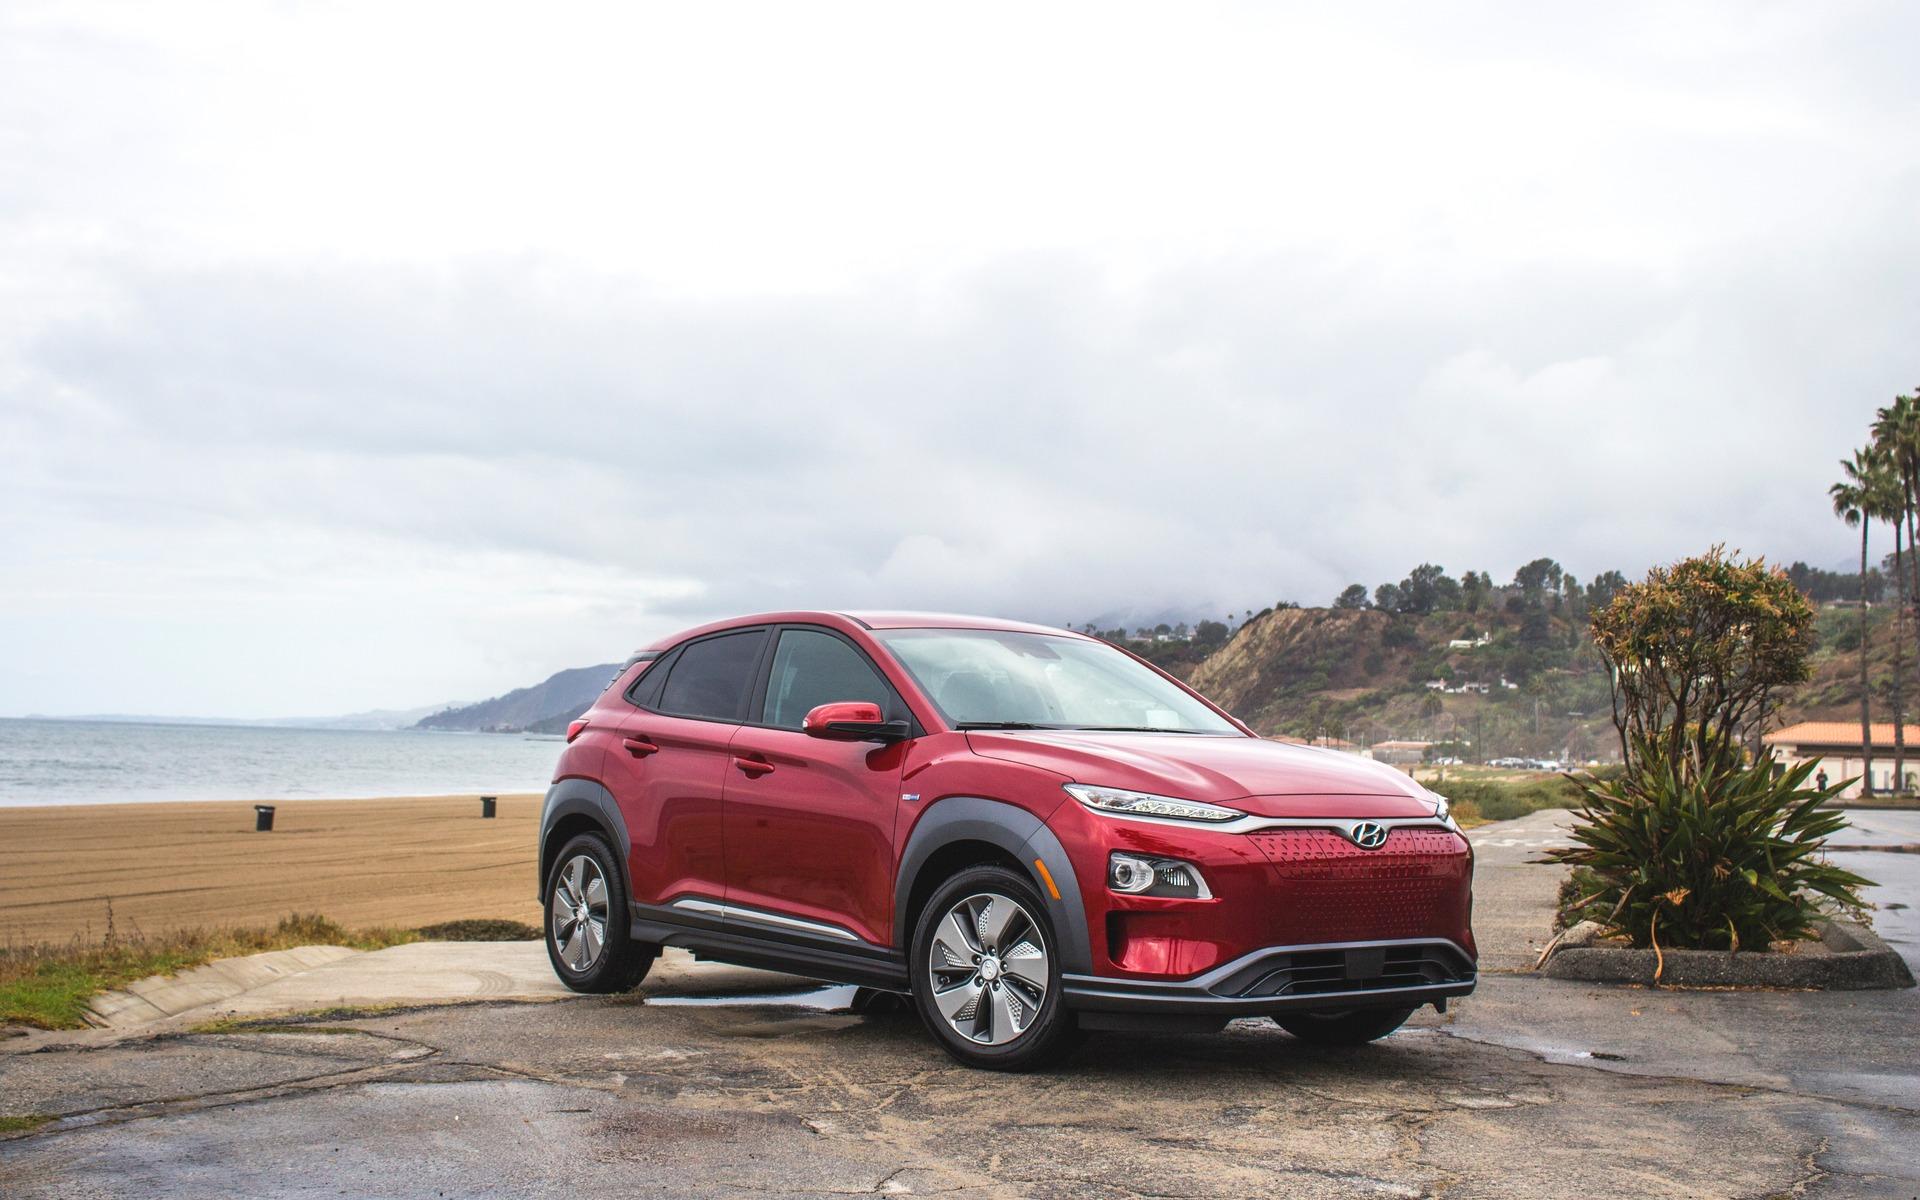 <p>Hyundai Kona &eacute;lectrique 2019</p>